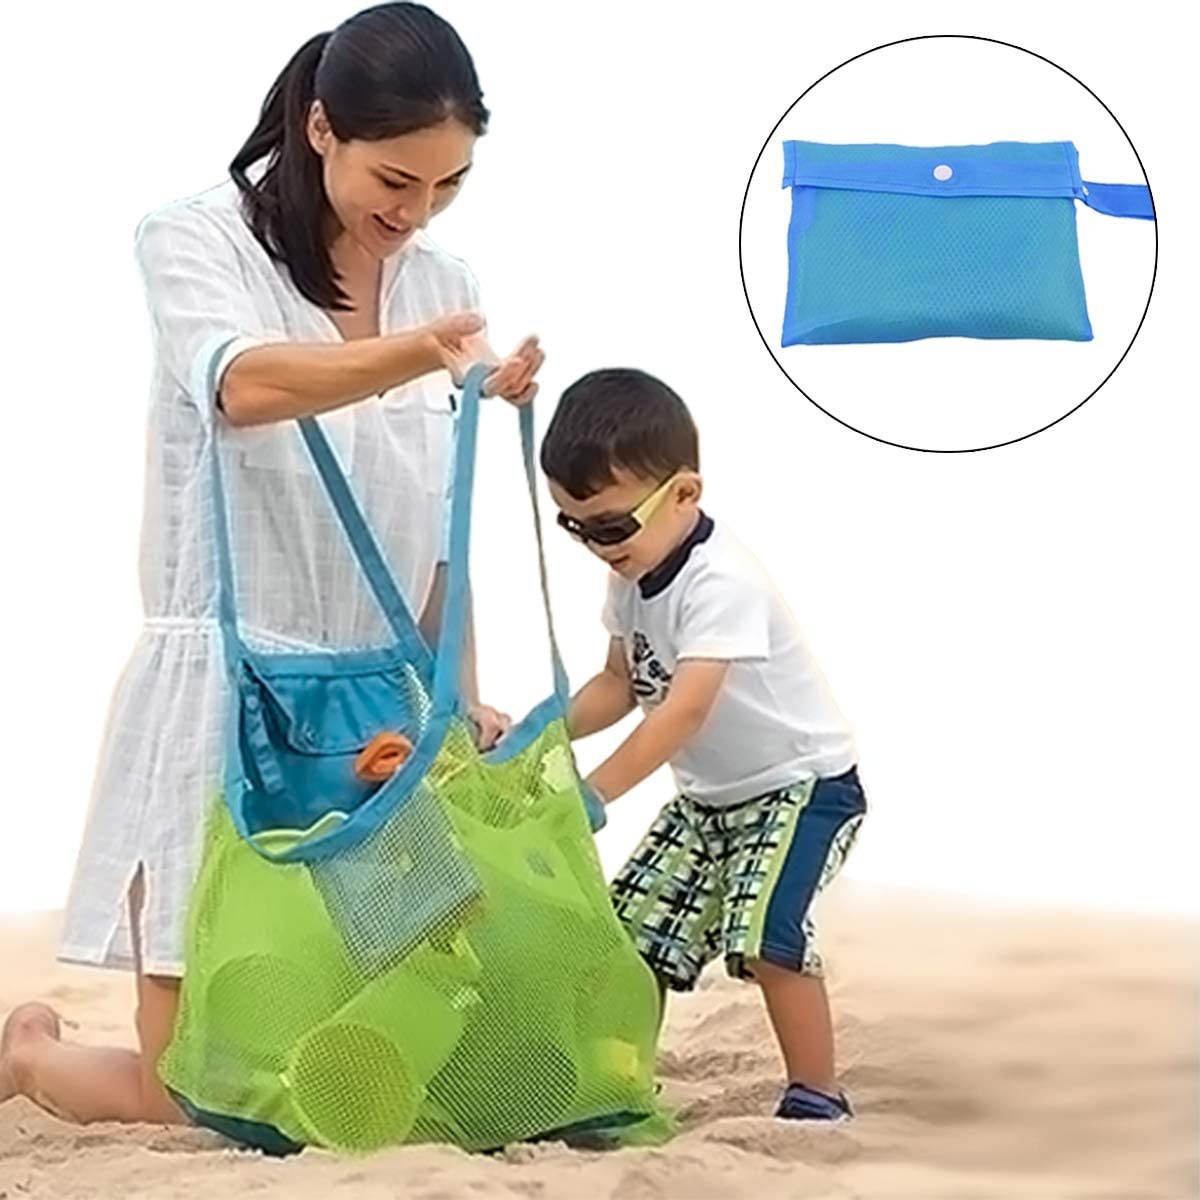 Zoiibuy Bolsa de Playa de Malla, Plegable Bolsa De Almacenaje para Juguetes De Playa De Ninos